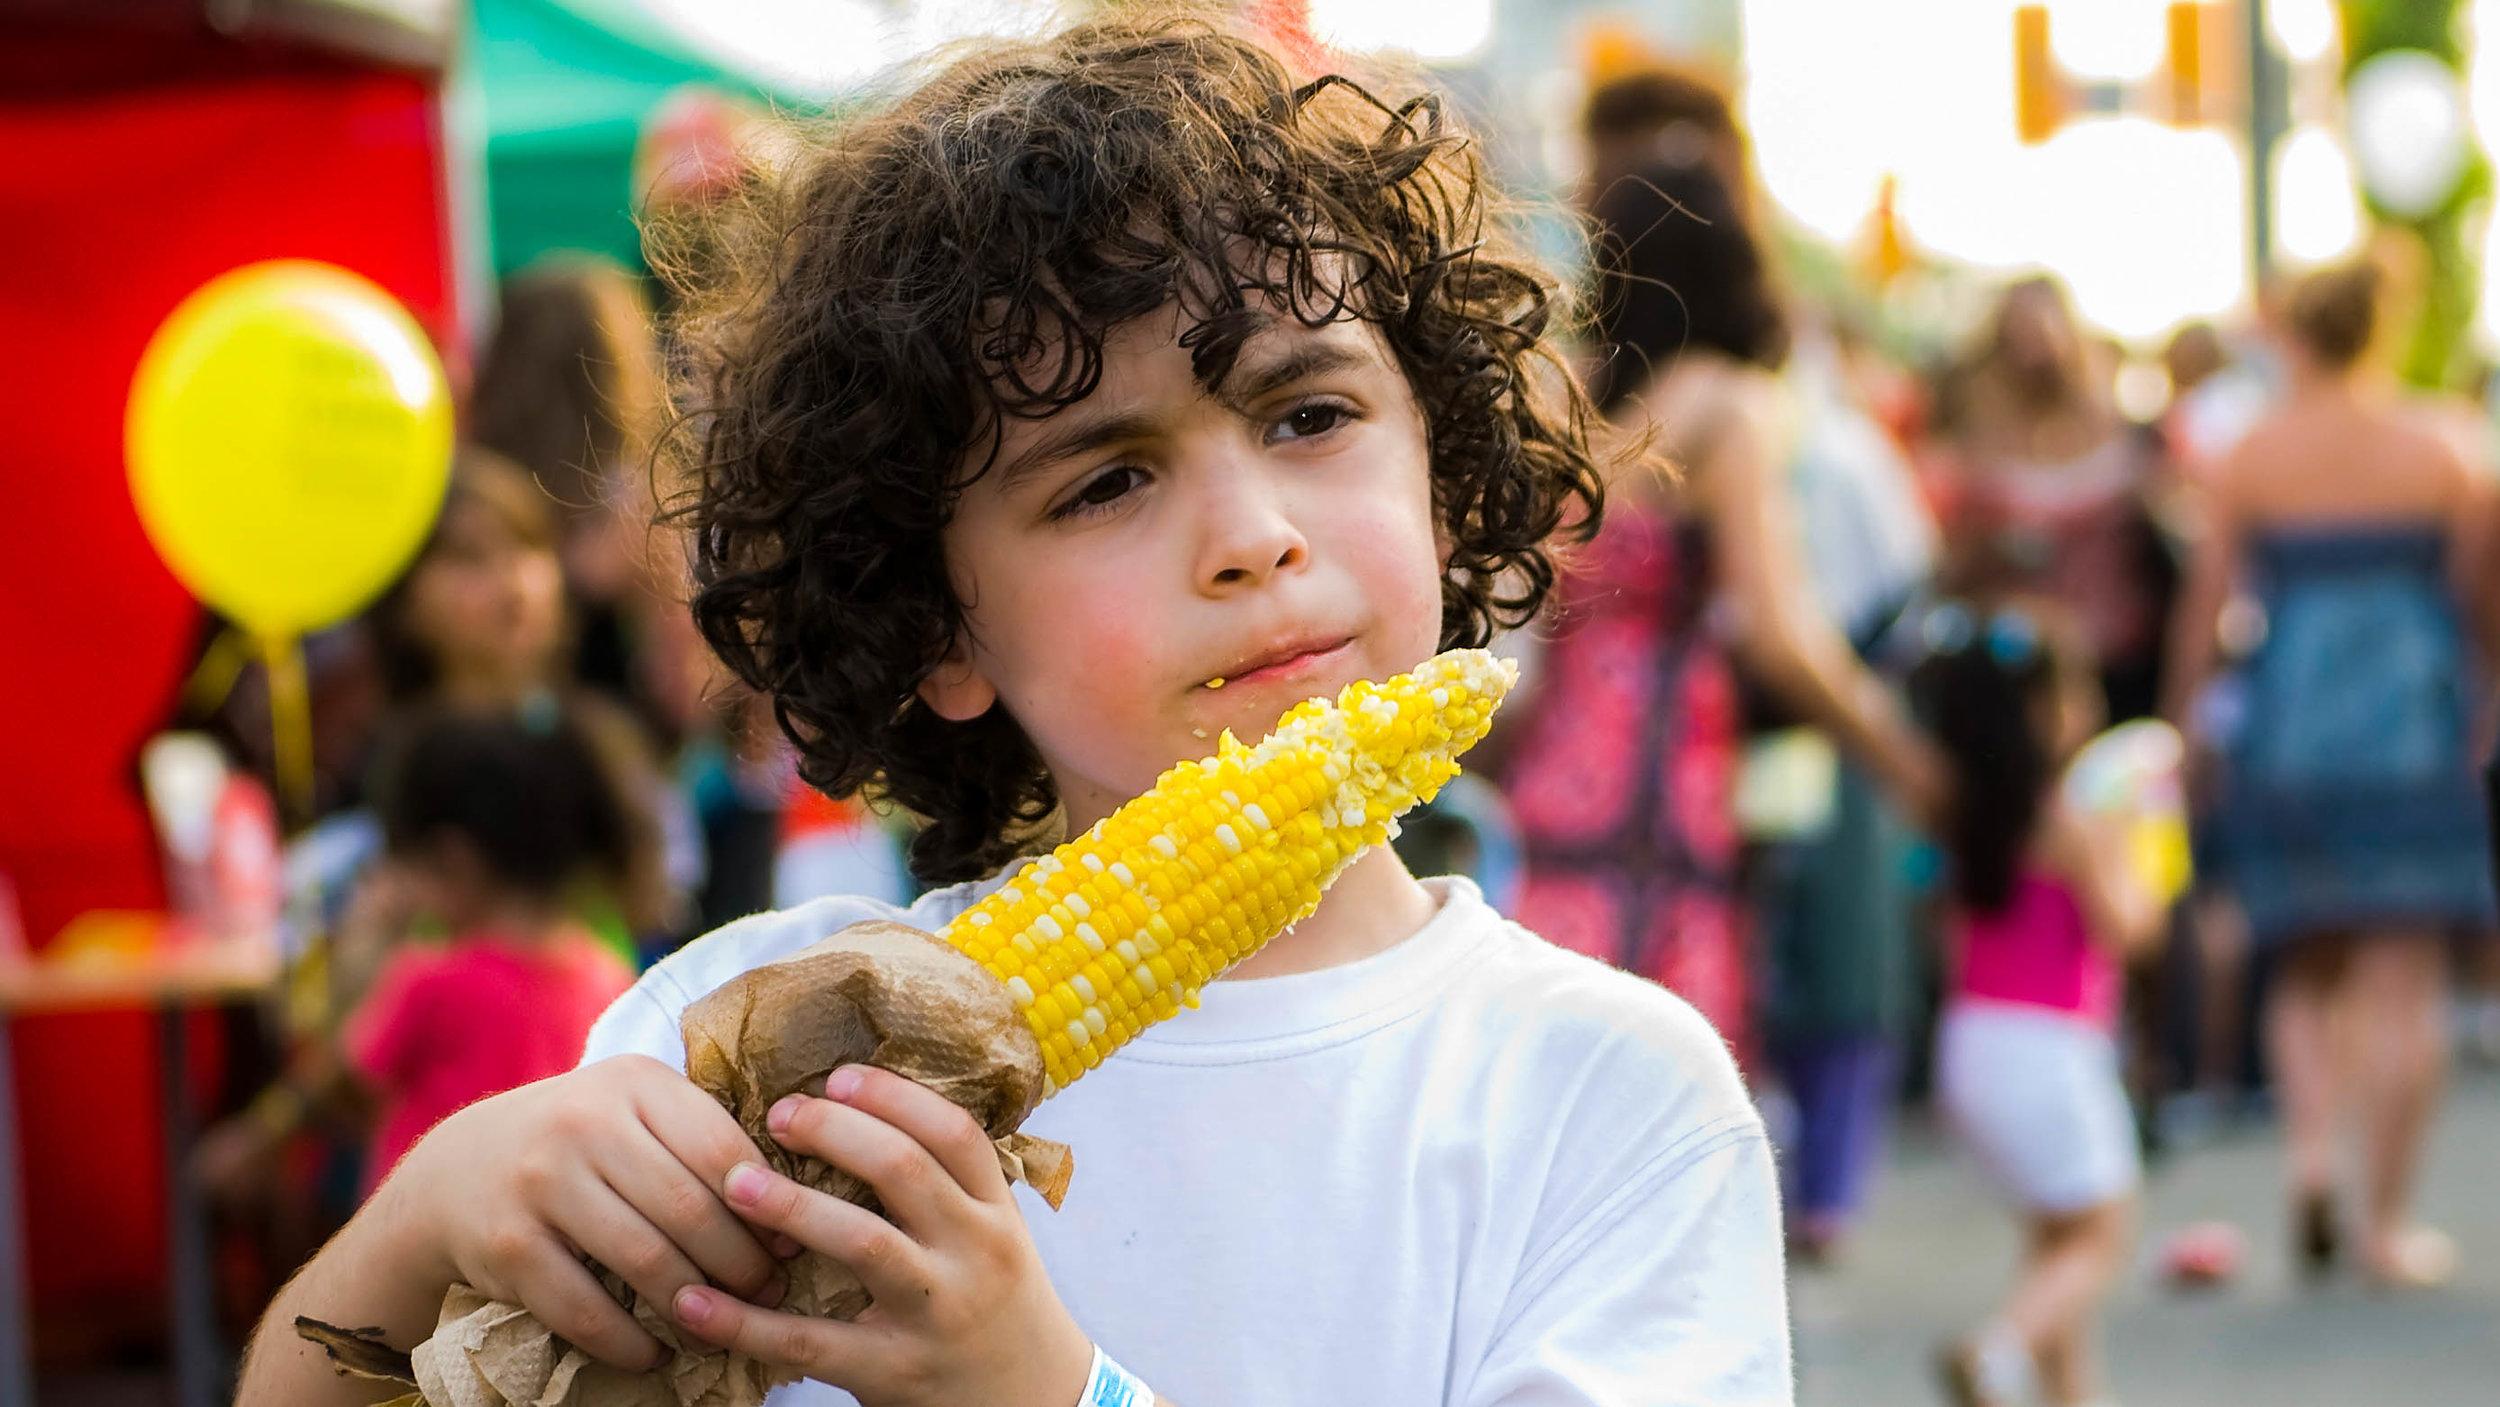 corn-alr-3.jpg